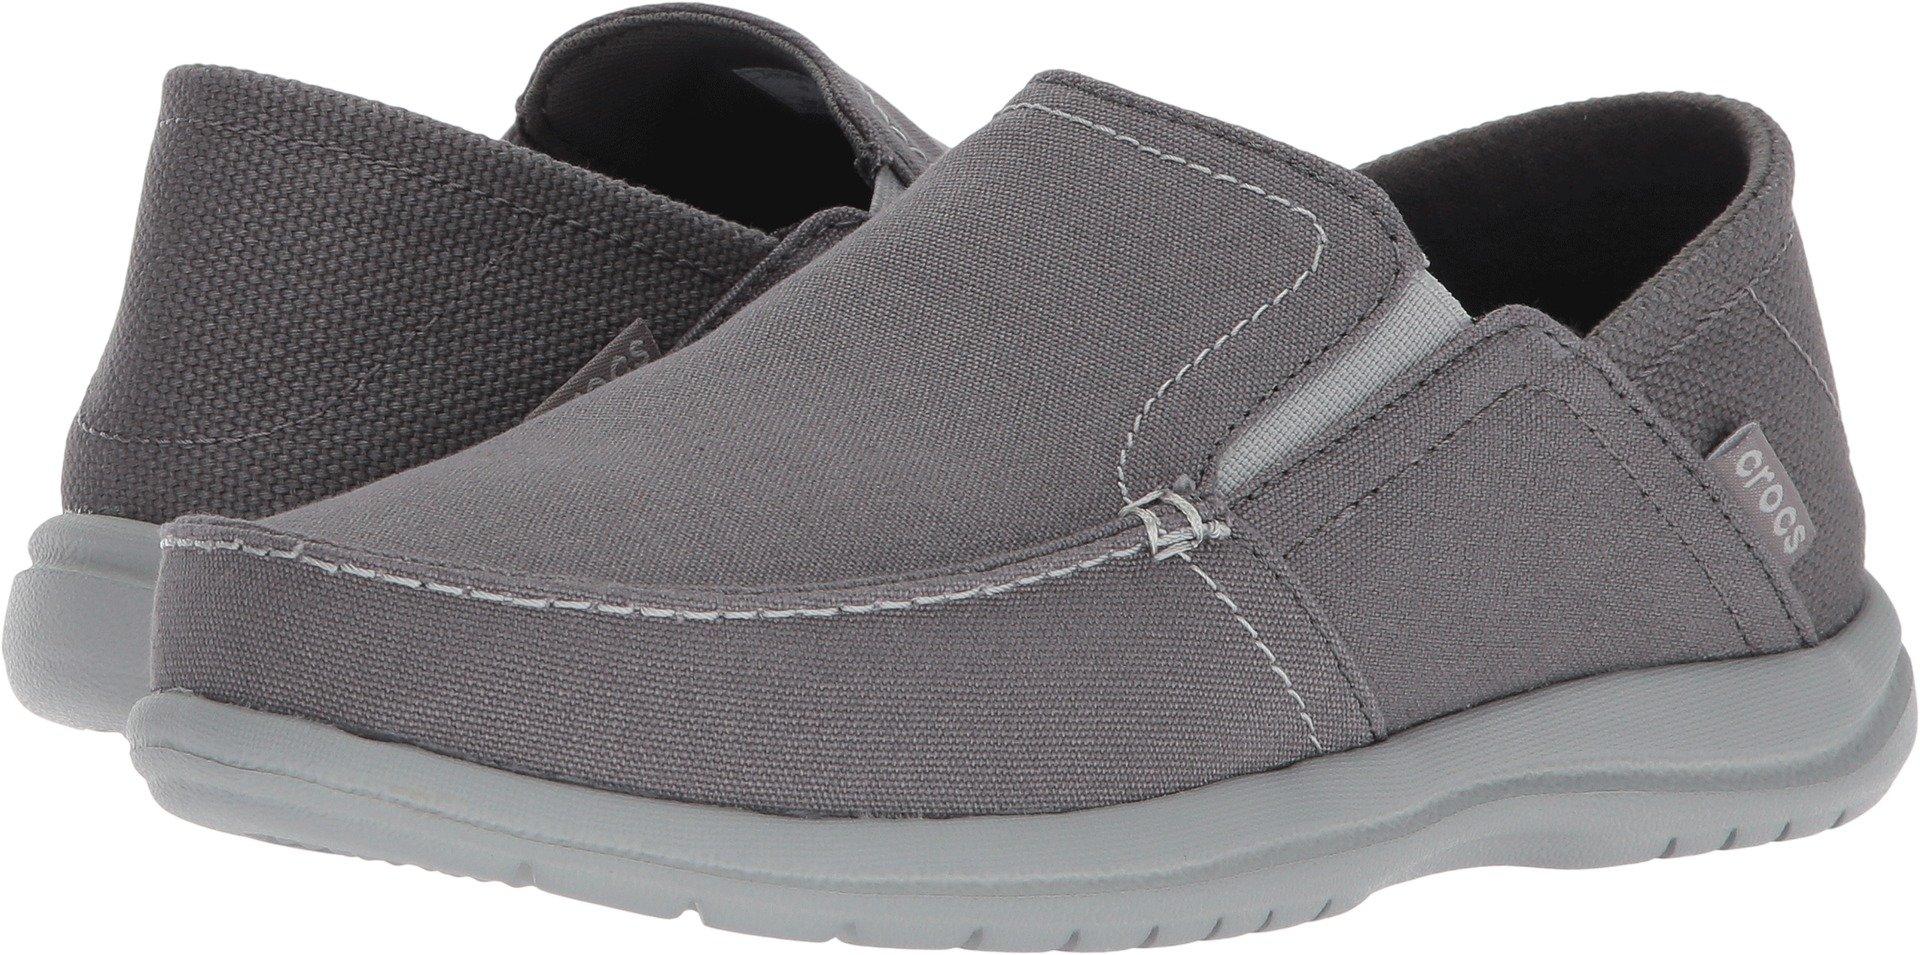 Crocs Men's Santa Cruz Convertible Slip-on Loafer, Light Grey/Slate Grey, 10 M US by Crocs